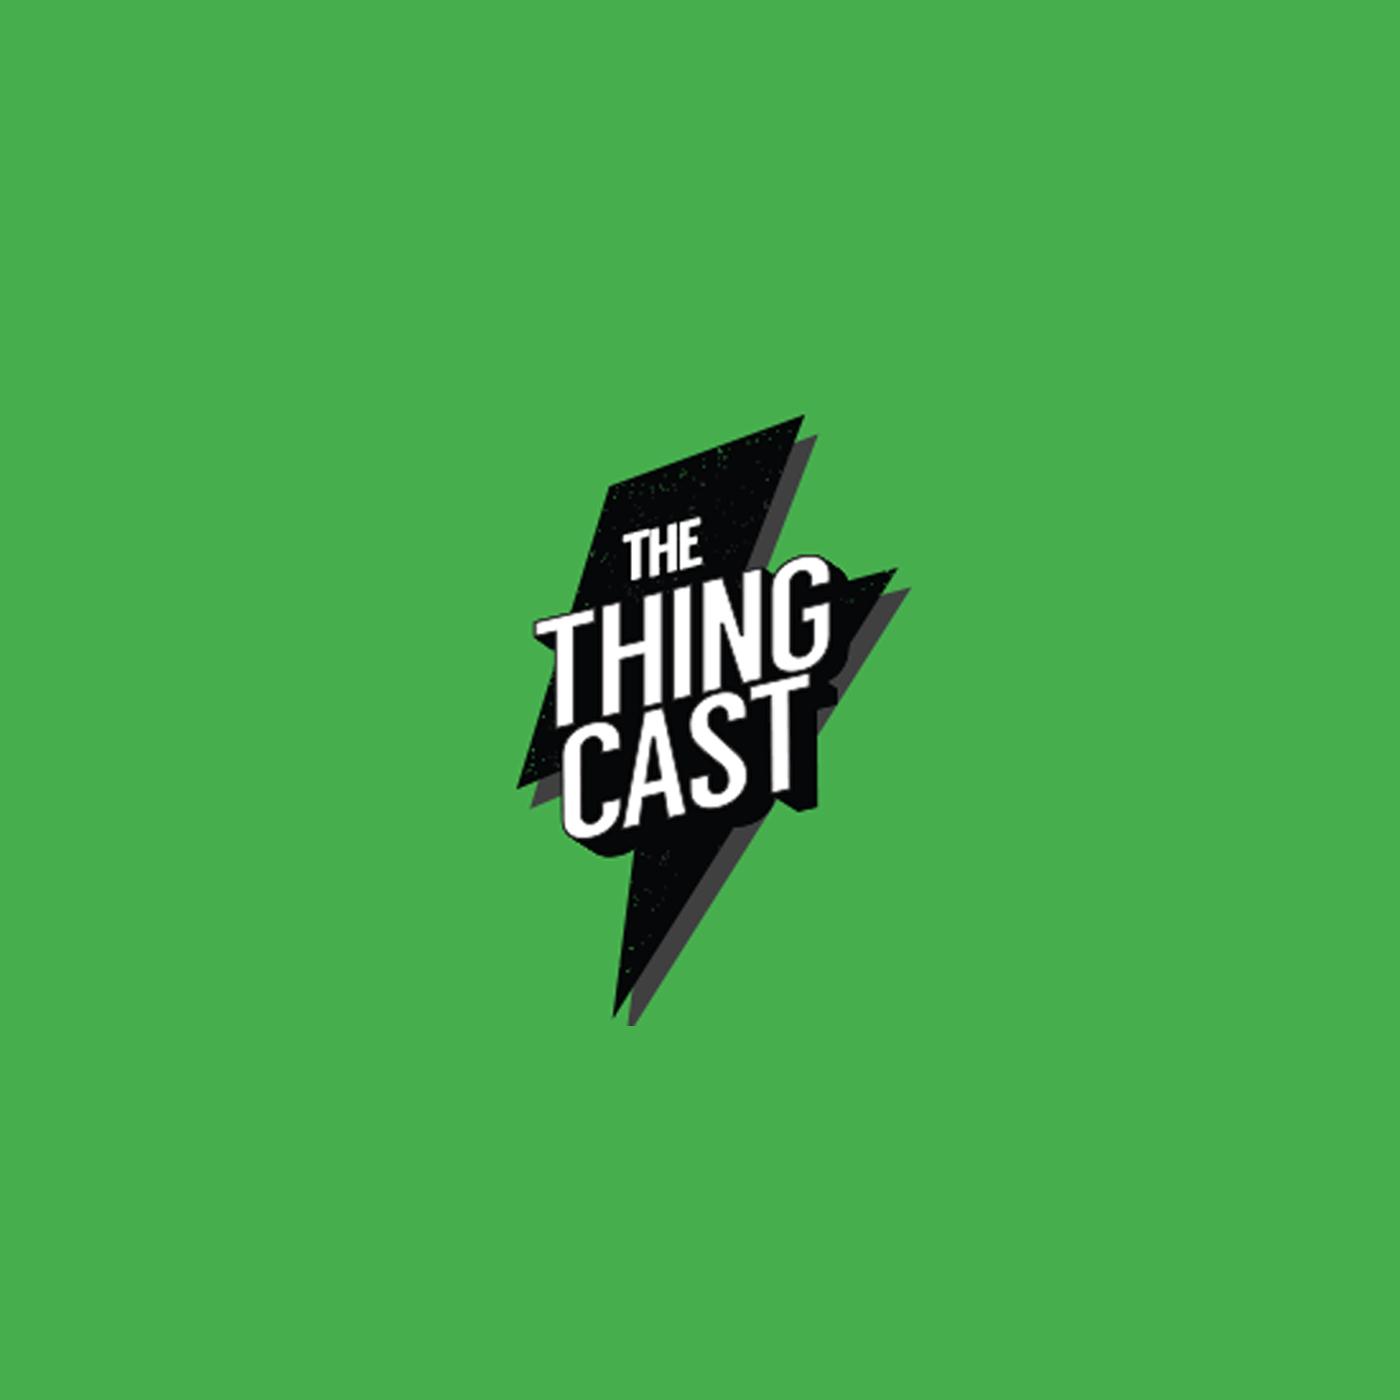 TheThingcast